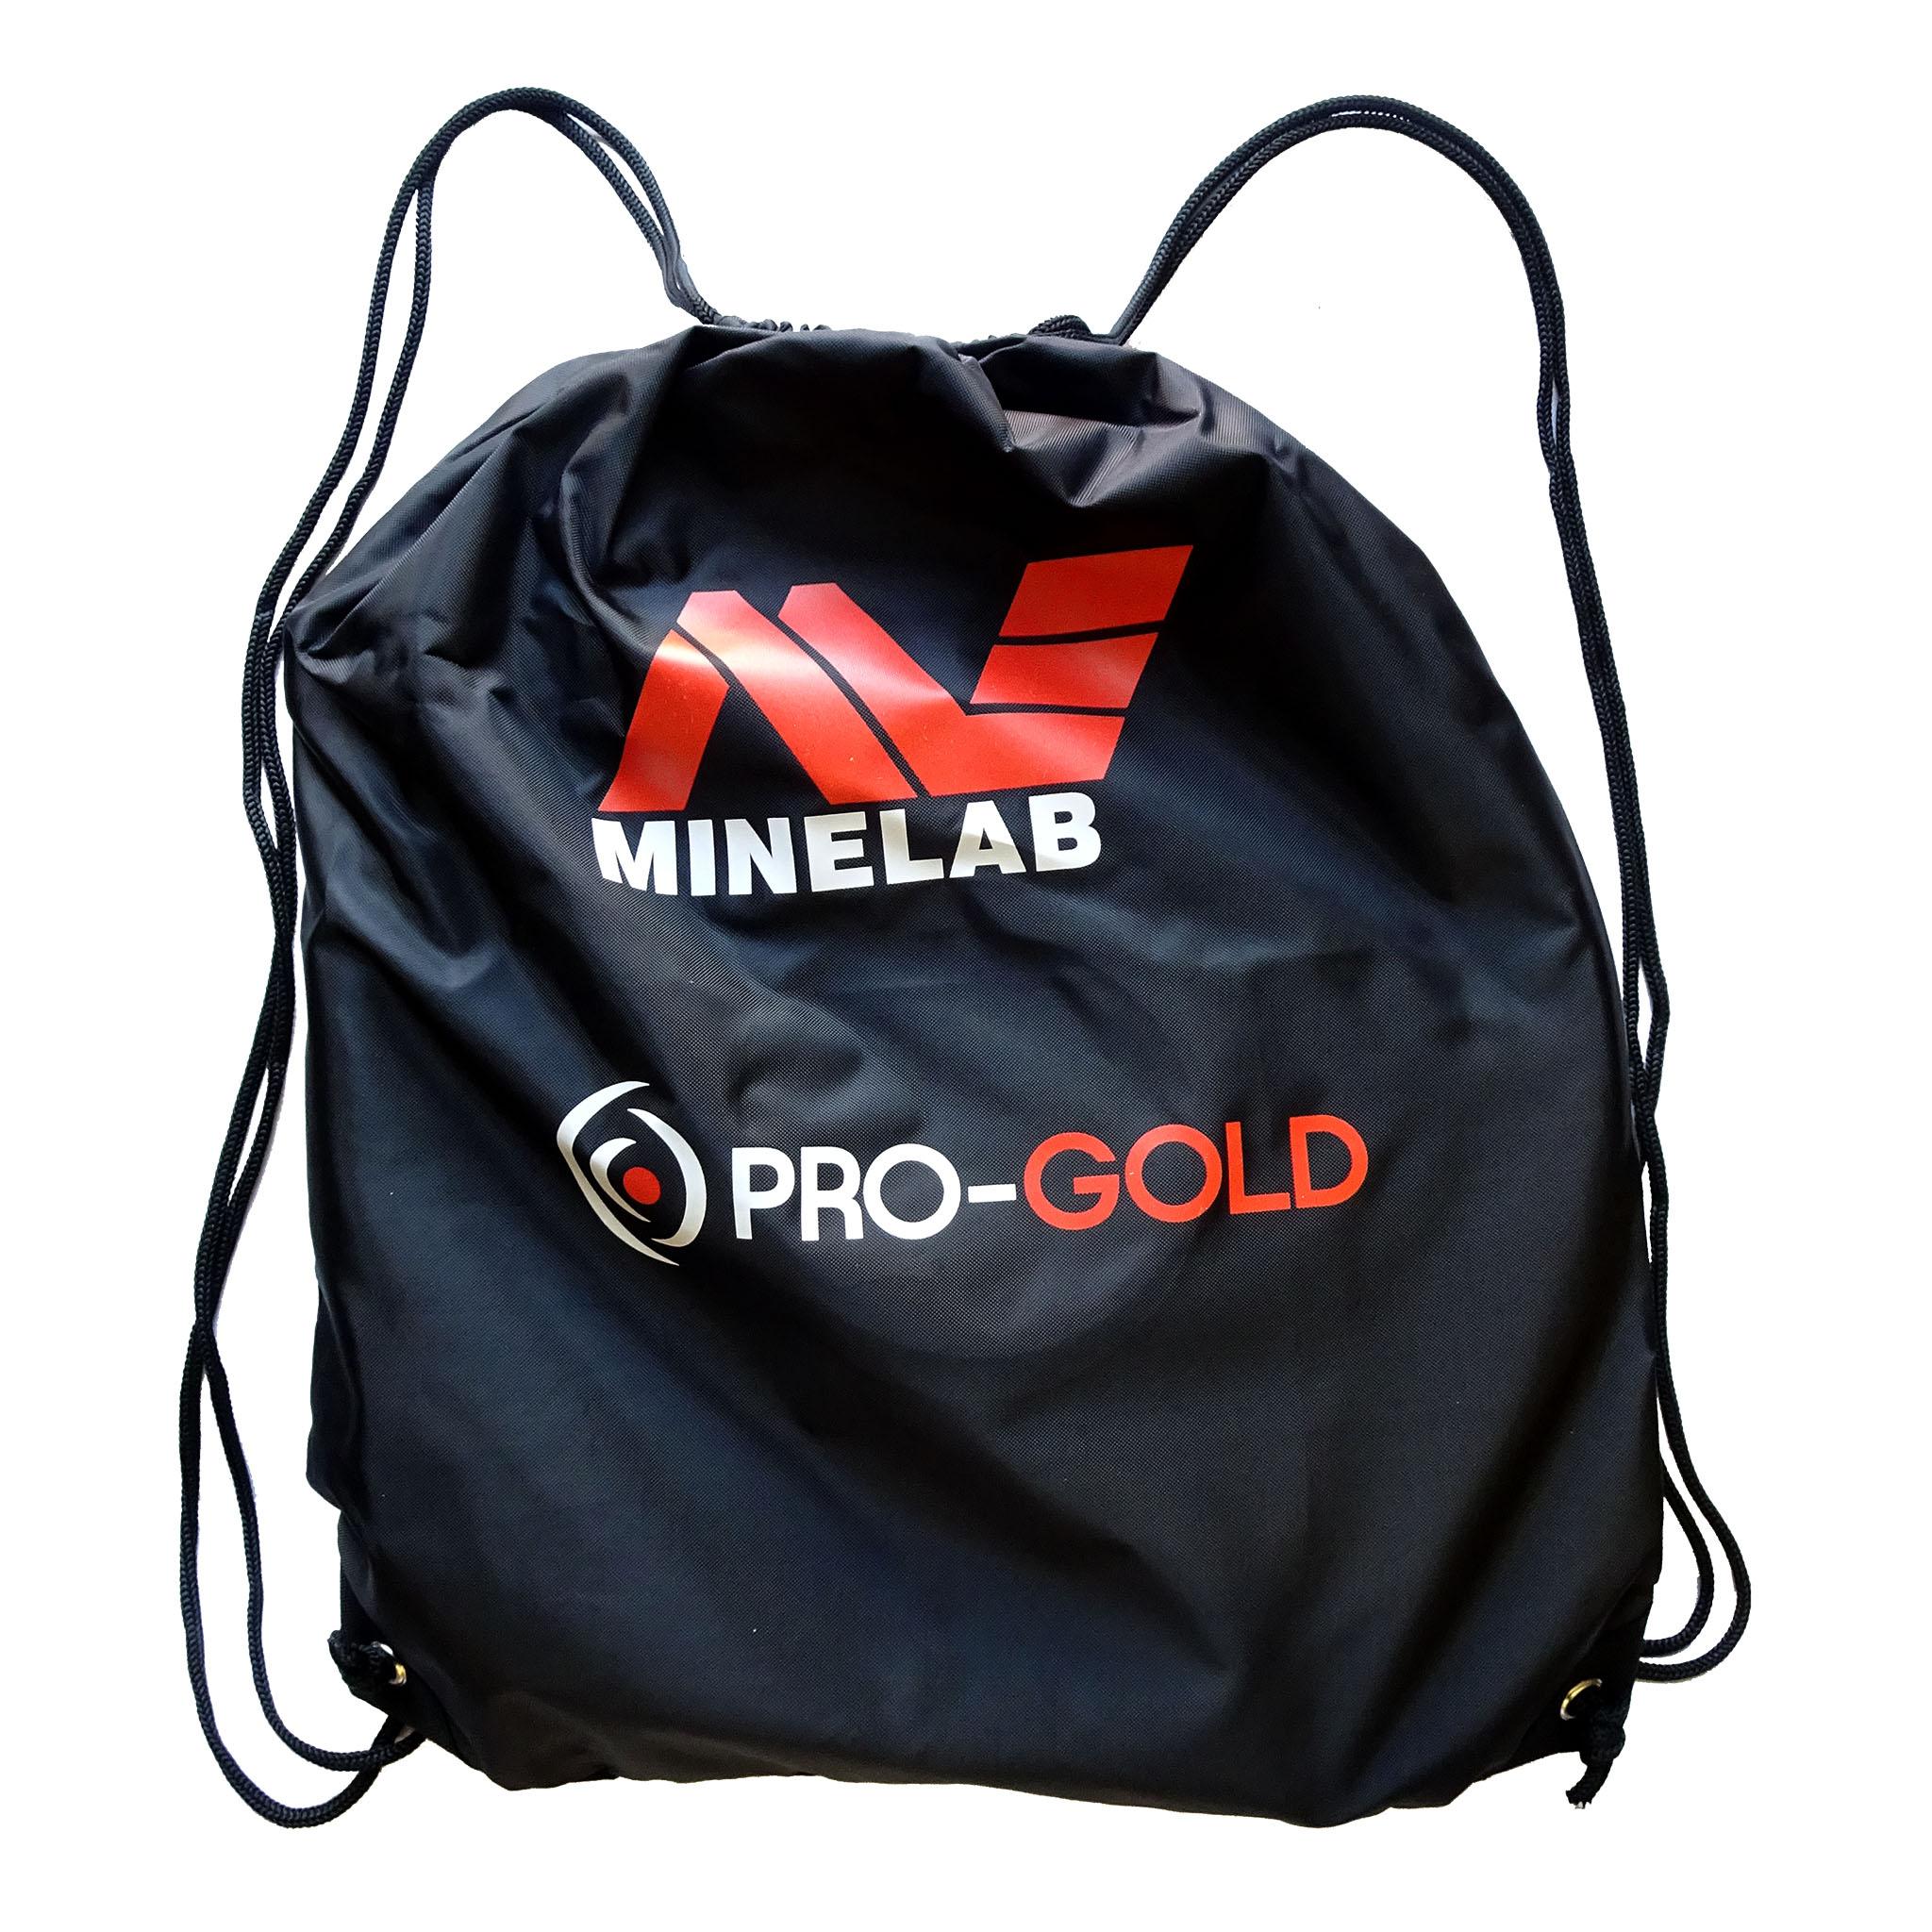 Convertible Carry Bag